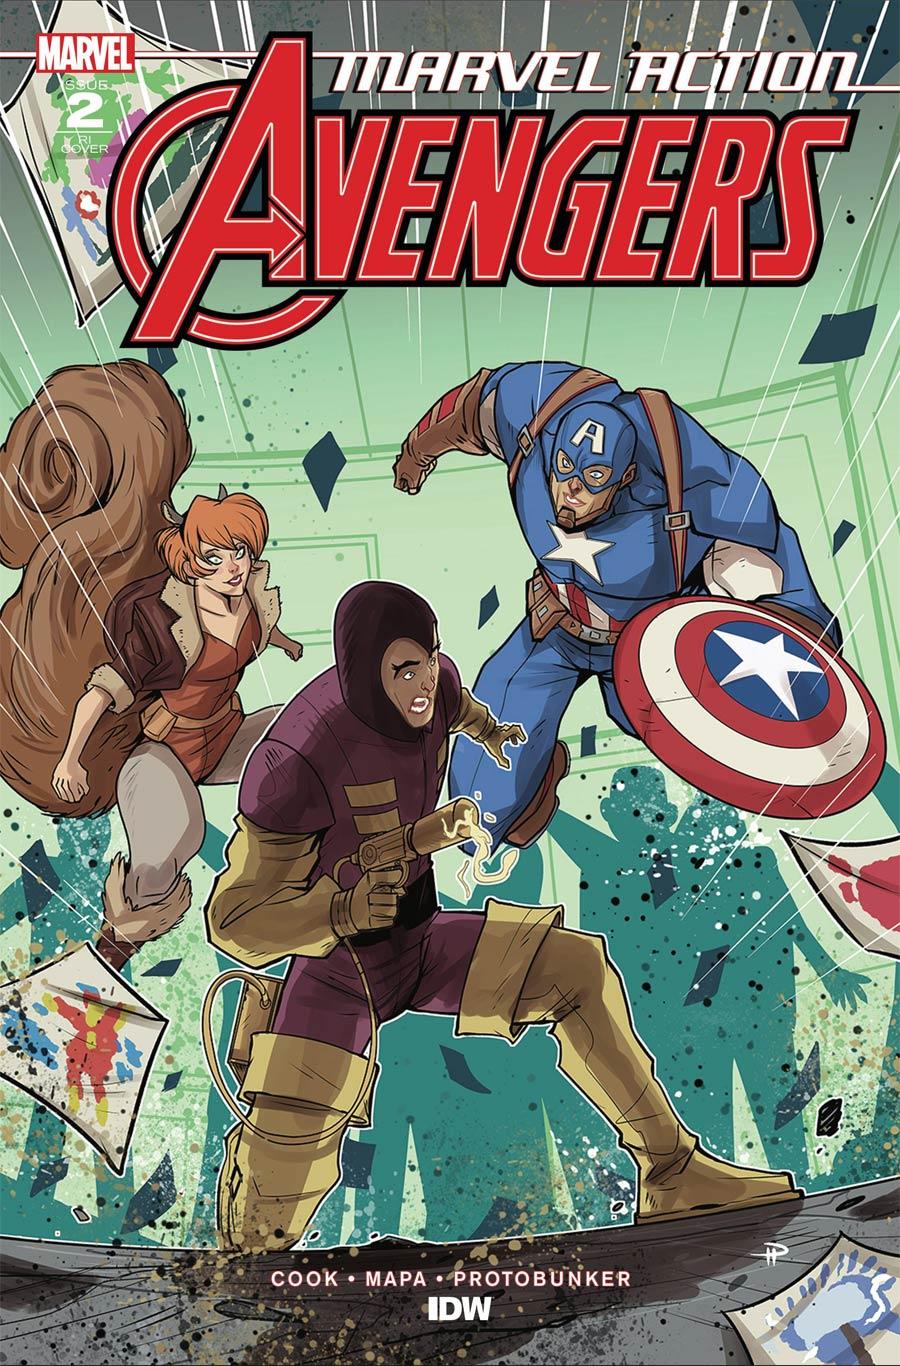 Marvel Action Avengers Vol 2 #2 Cover B Incentive Denis Medri Variant Cover